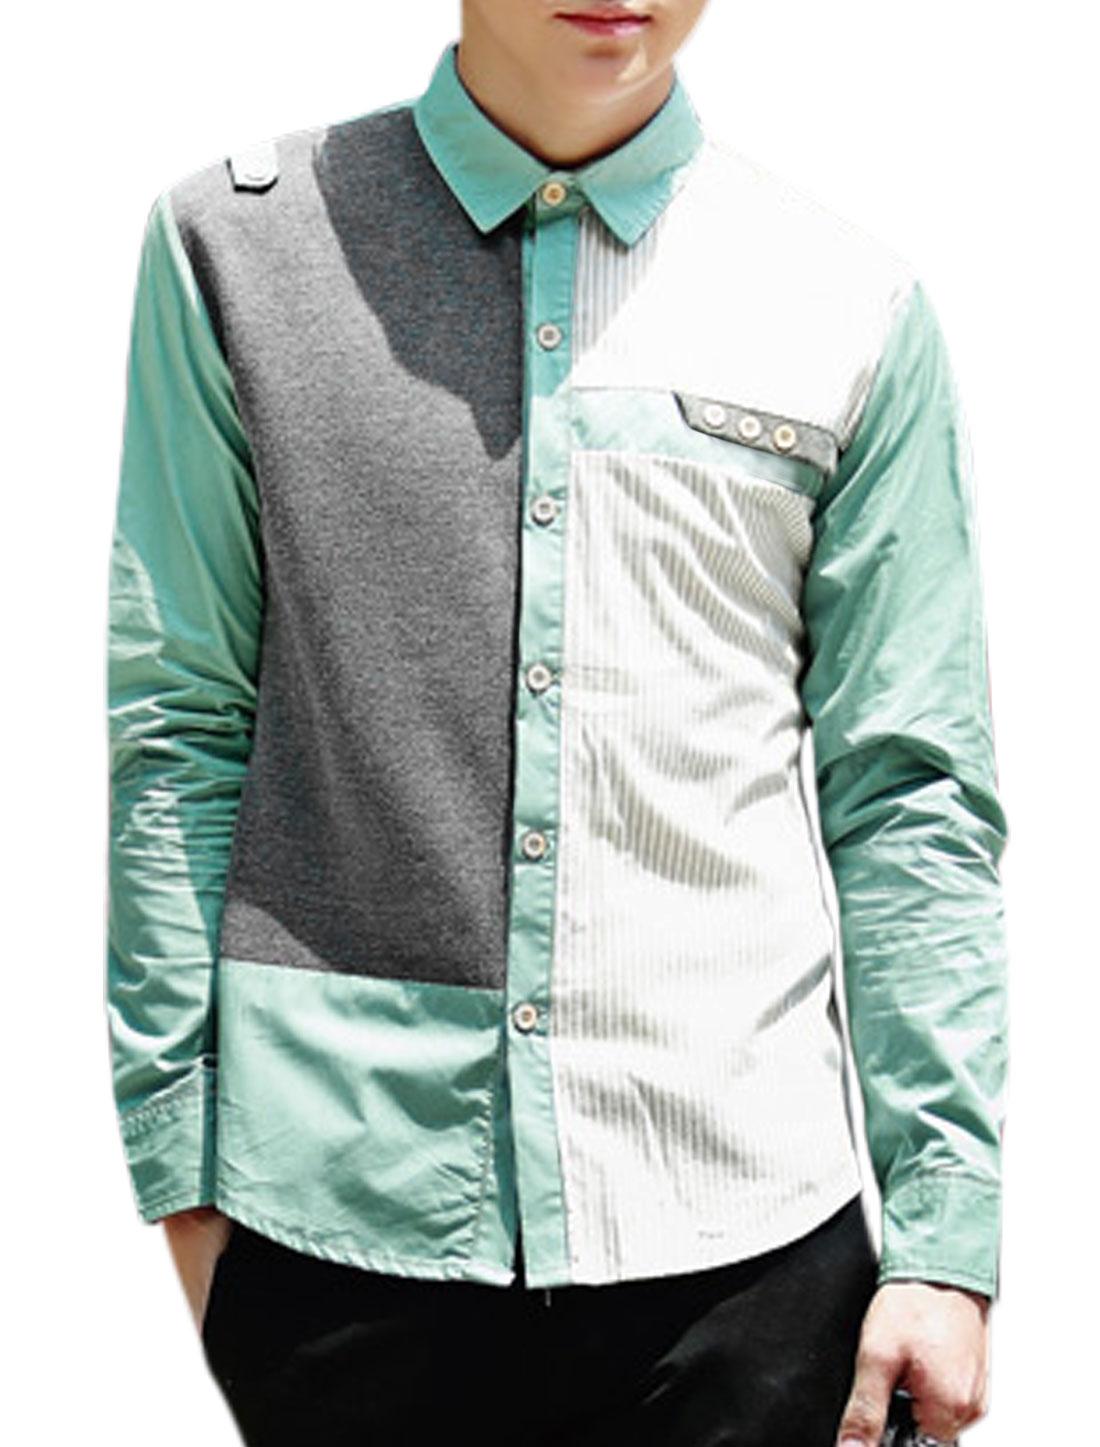 Men Point Collar Button Closure Front Panel Casual Shirt Light Green Gray M